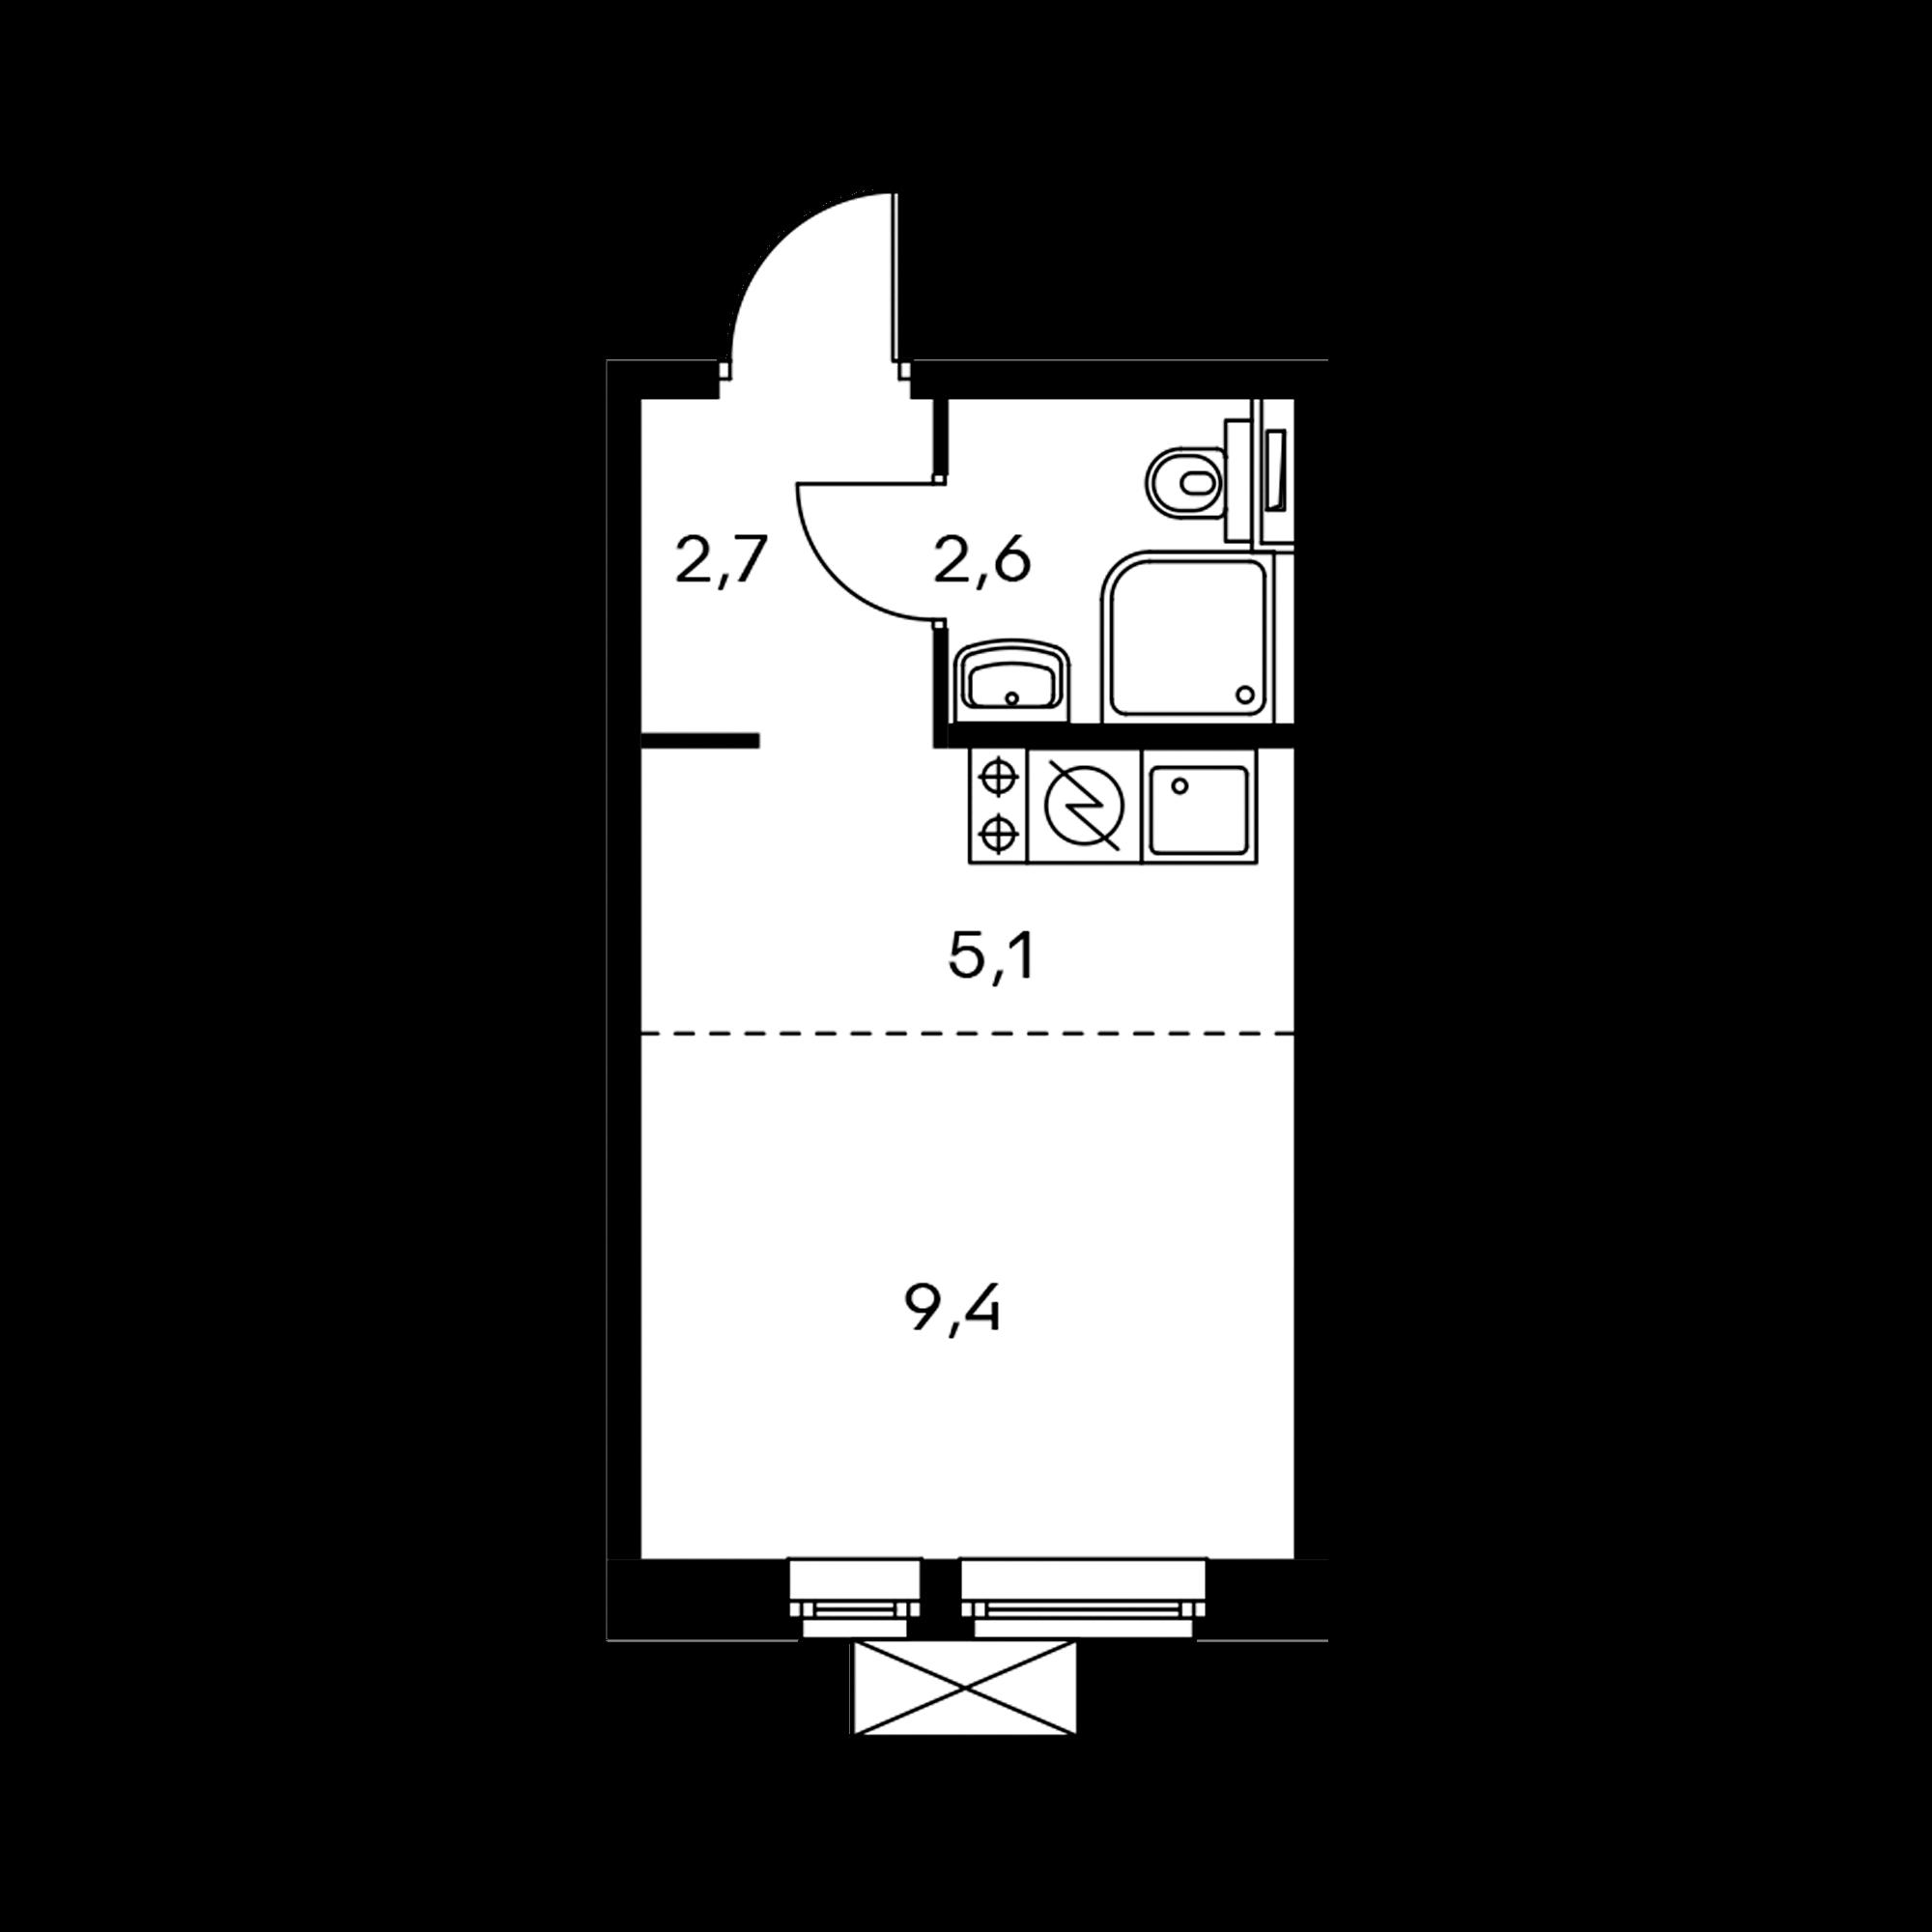 1NS1_3.6-1*